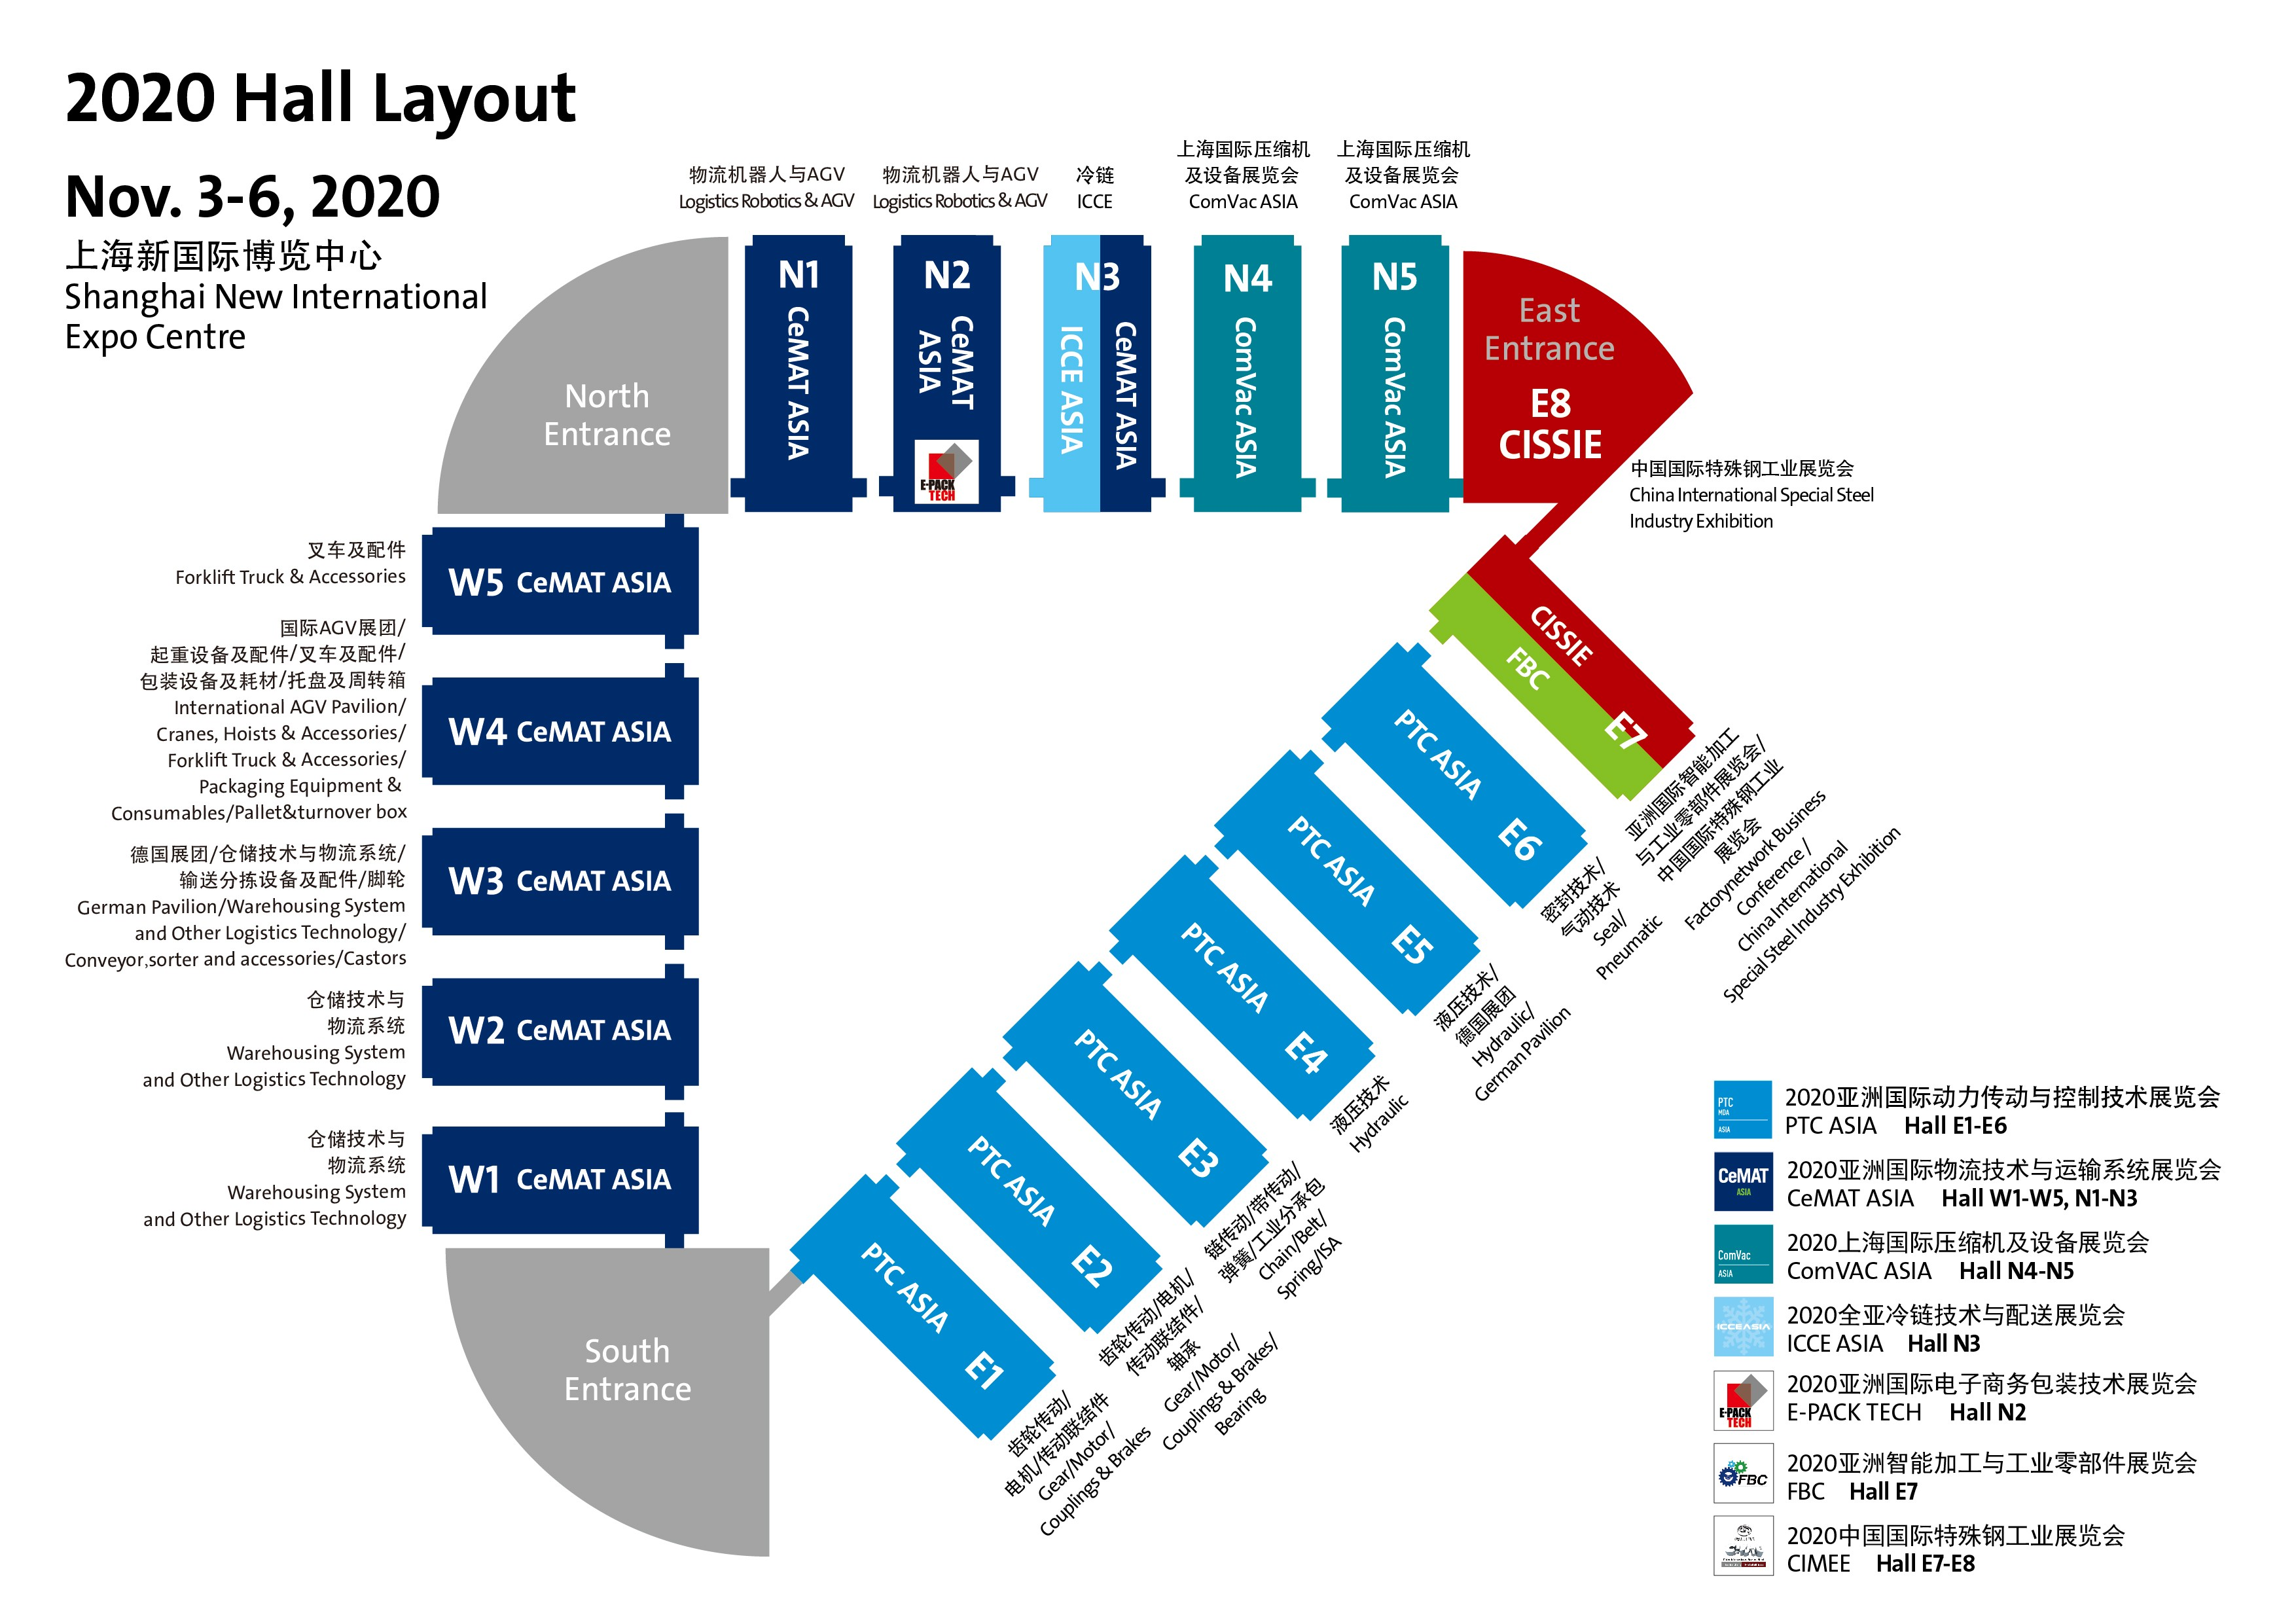 2020 Hall Layout.jpg